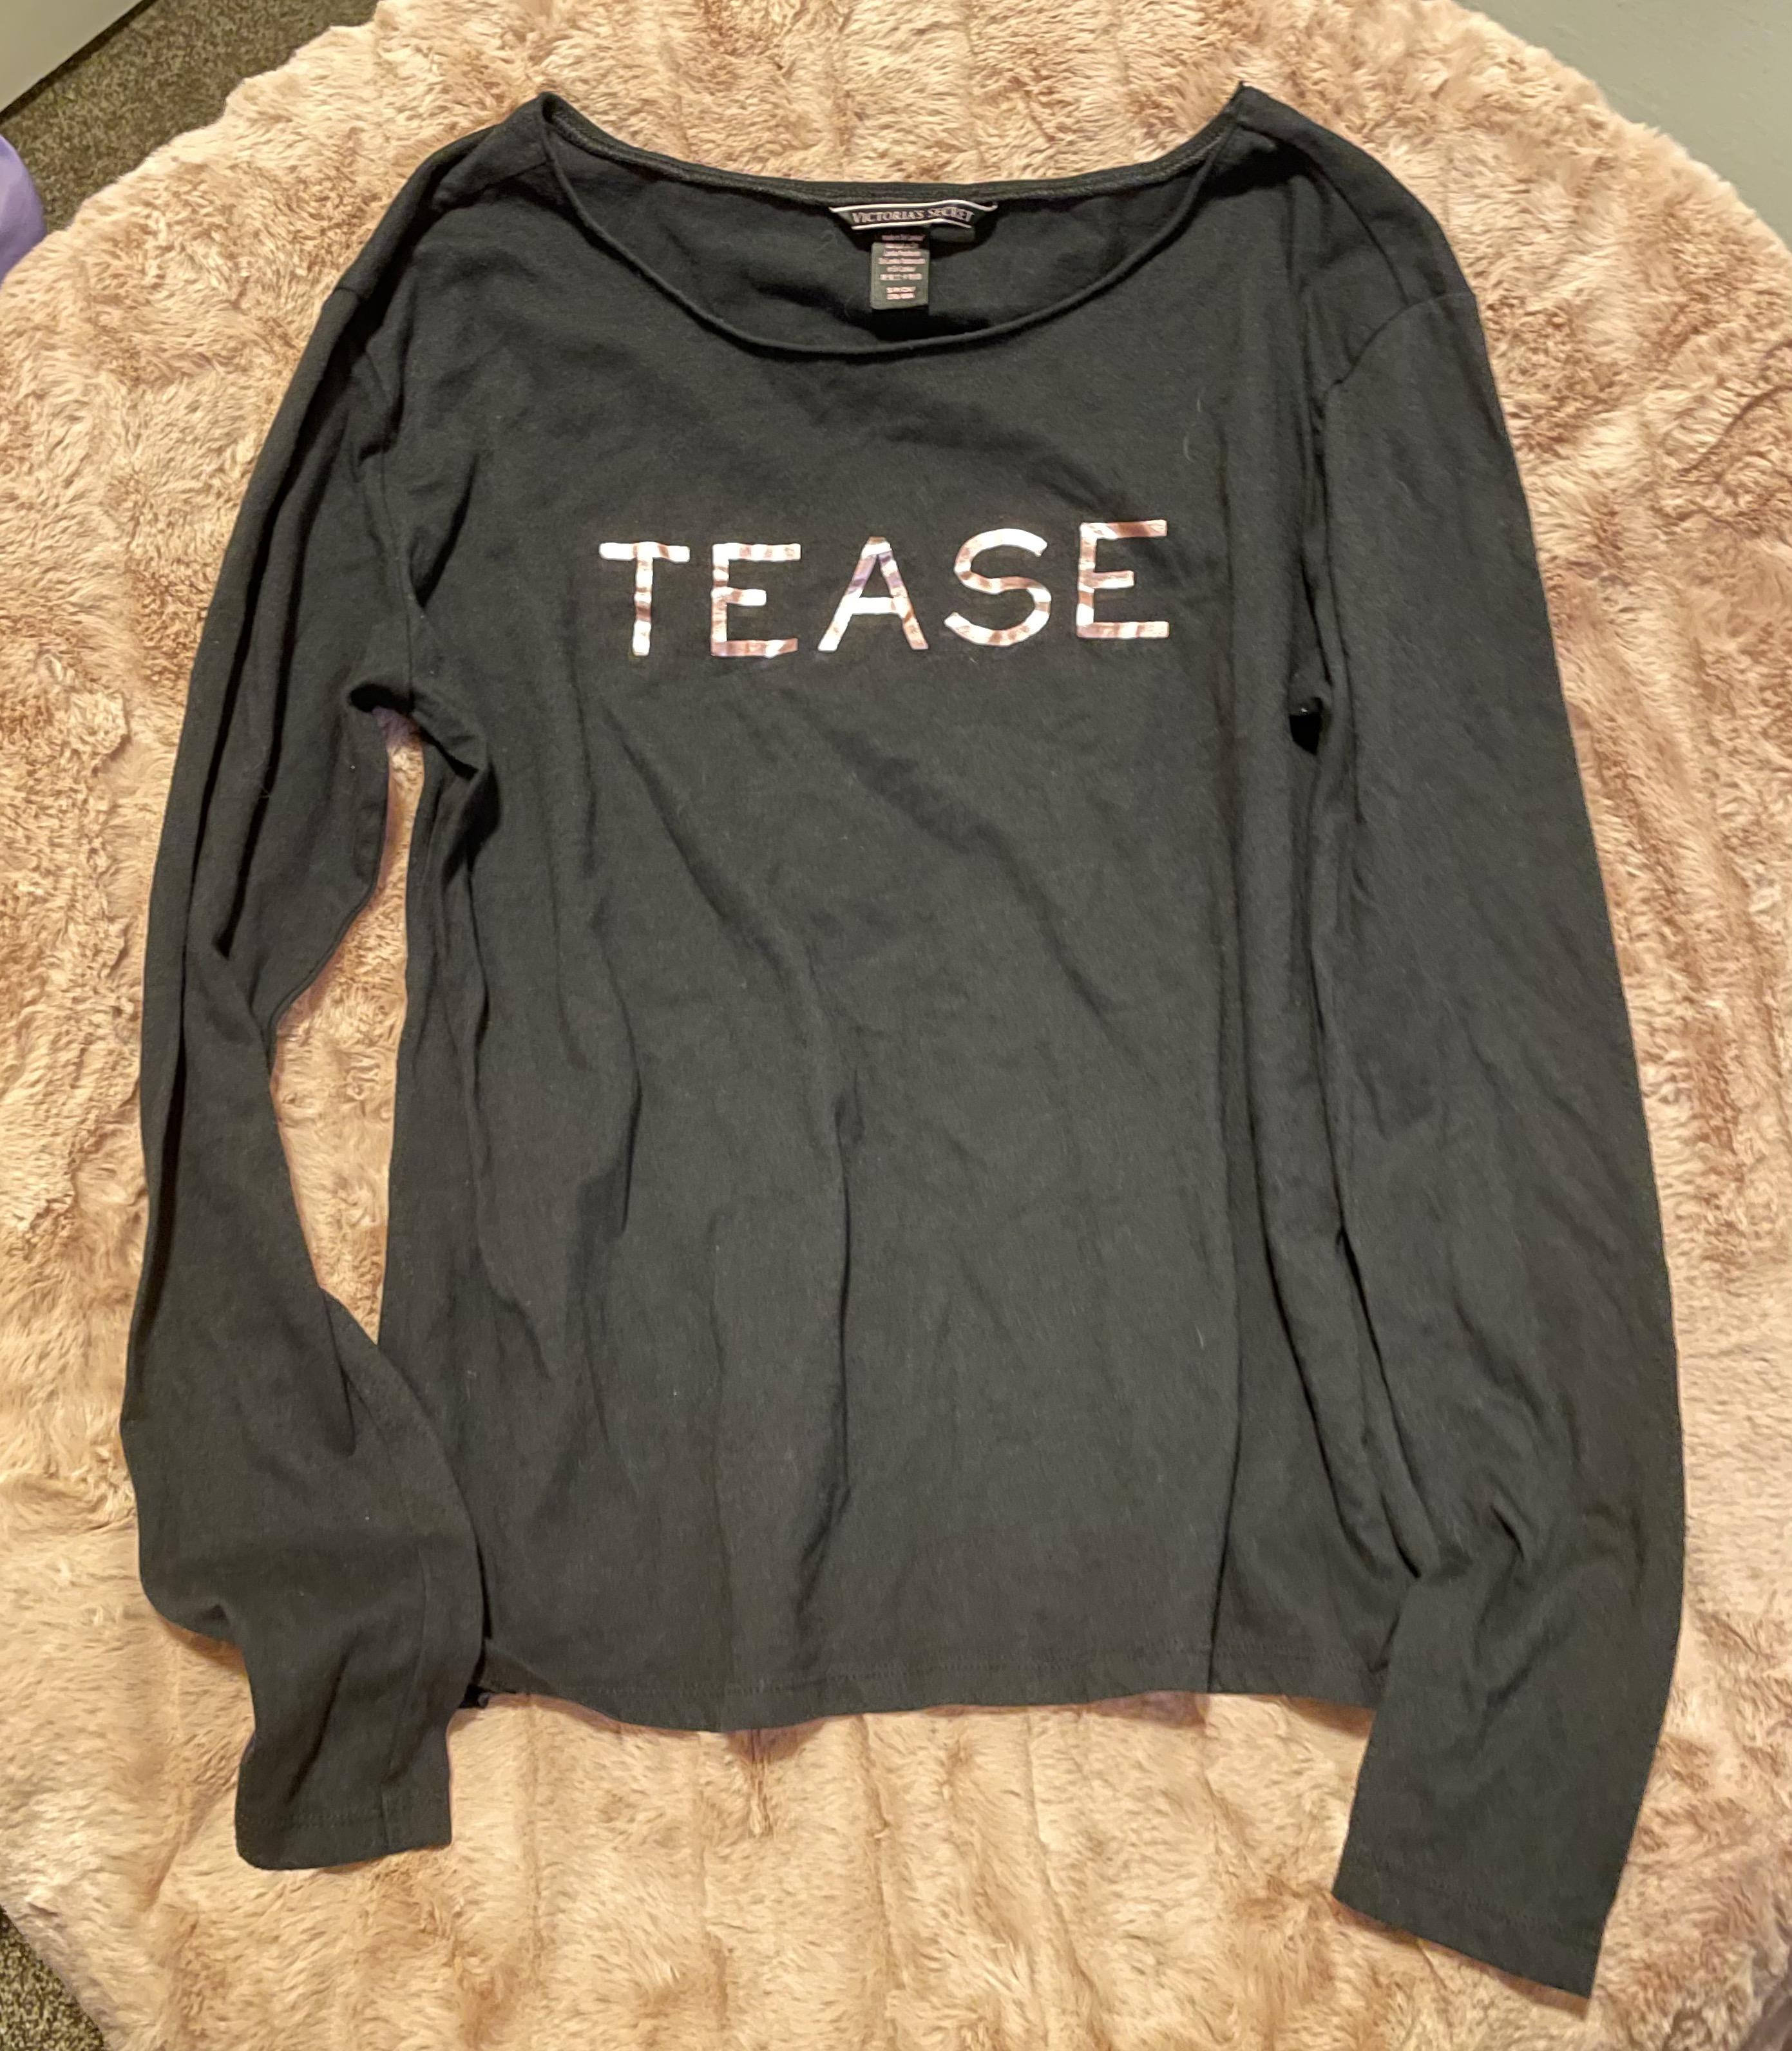 Victorias Secret   VS Tease Graphic Tee   Black Long Sleeve Women's Small Shirt